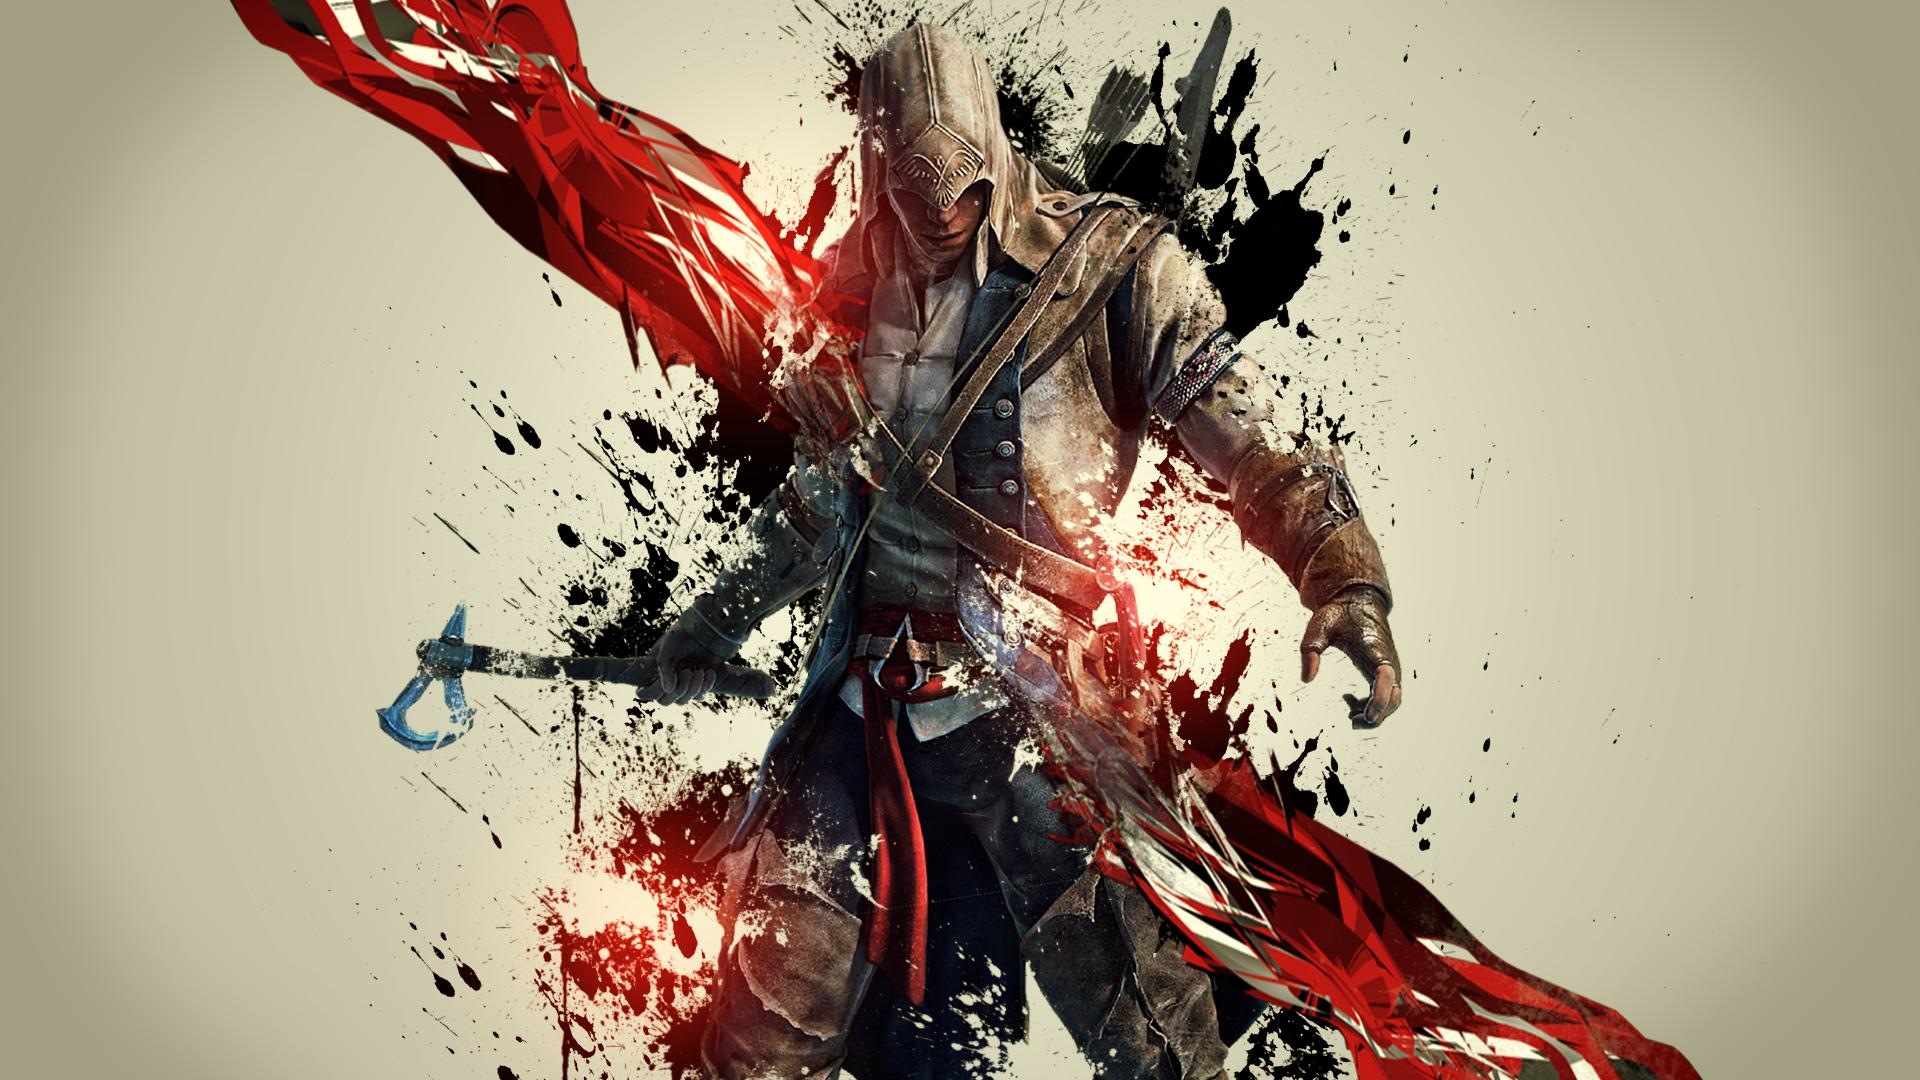 assassins creed 3 wallpaper - sf wallpaper